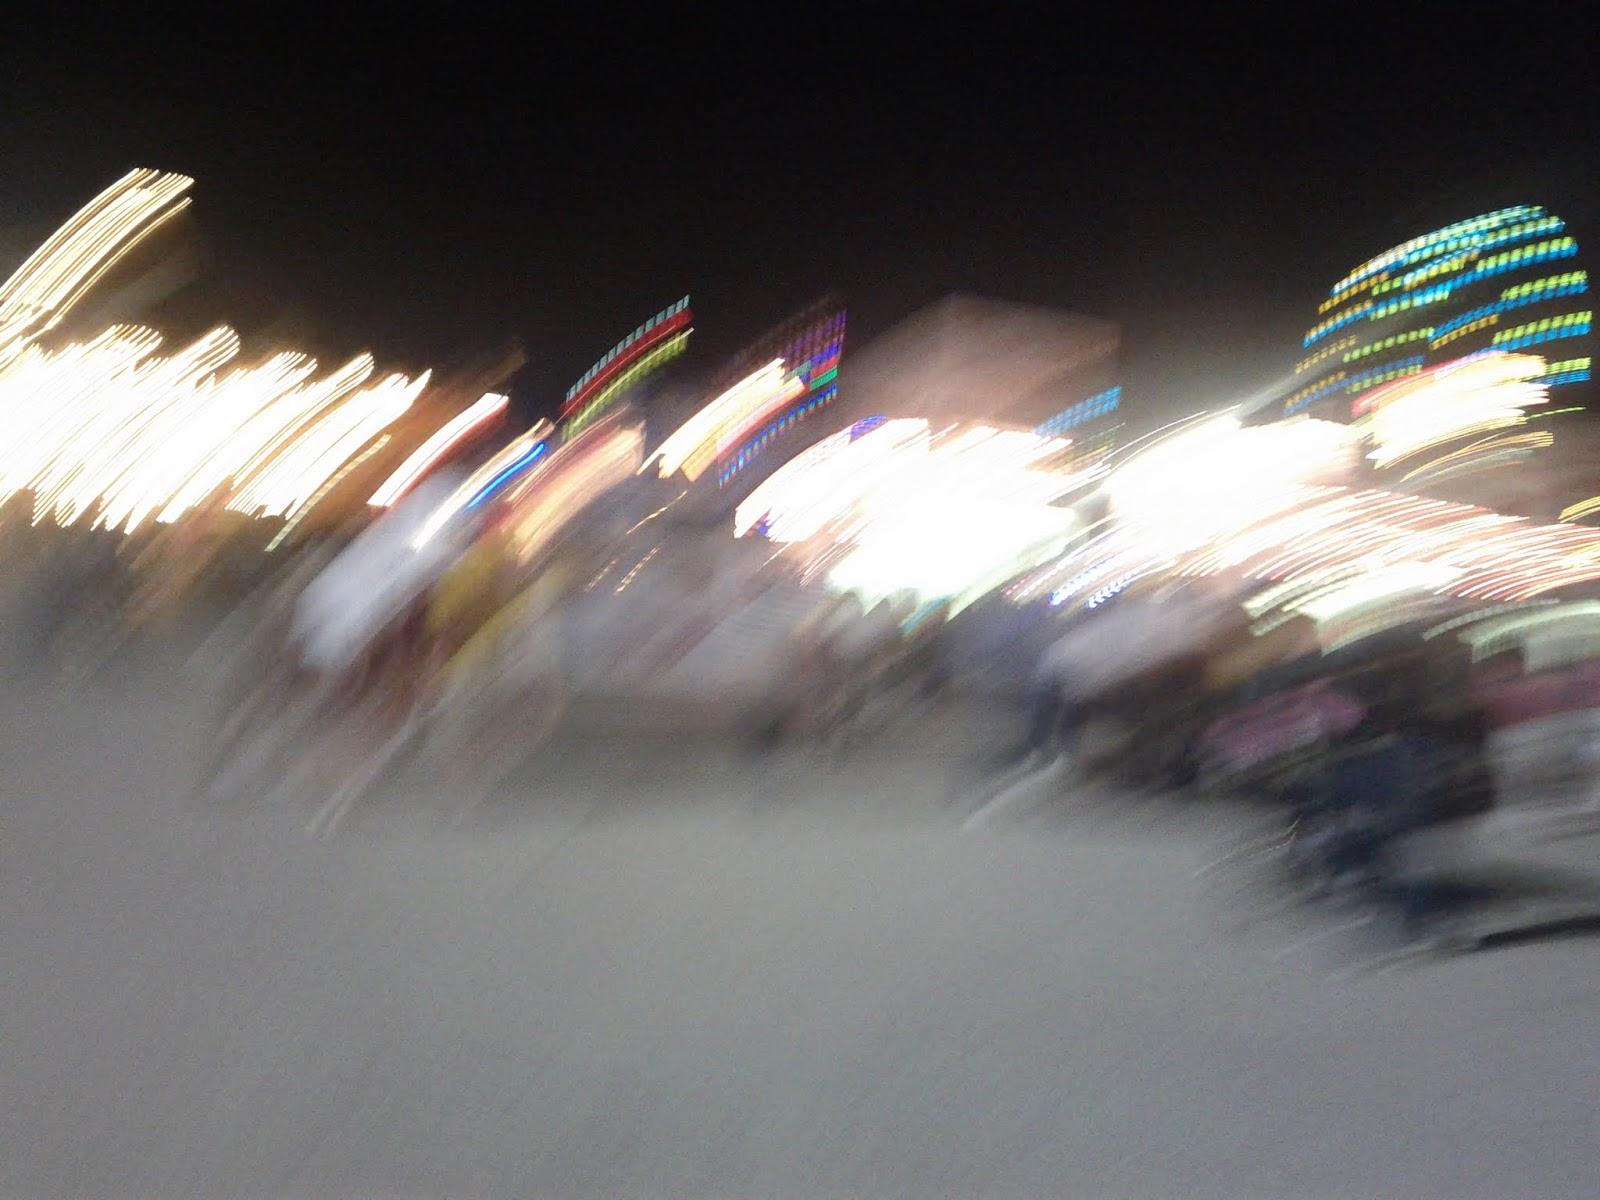 Fort Bend County Fair 2012 - IMG_20121006_193848.jpg